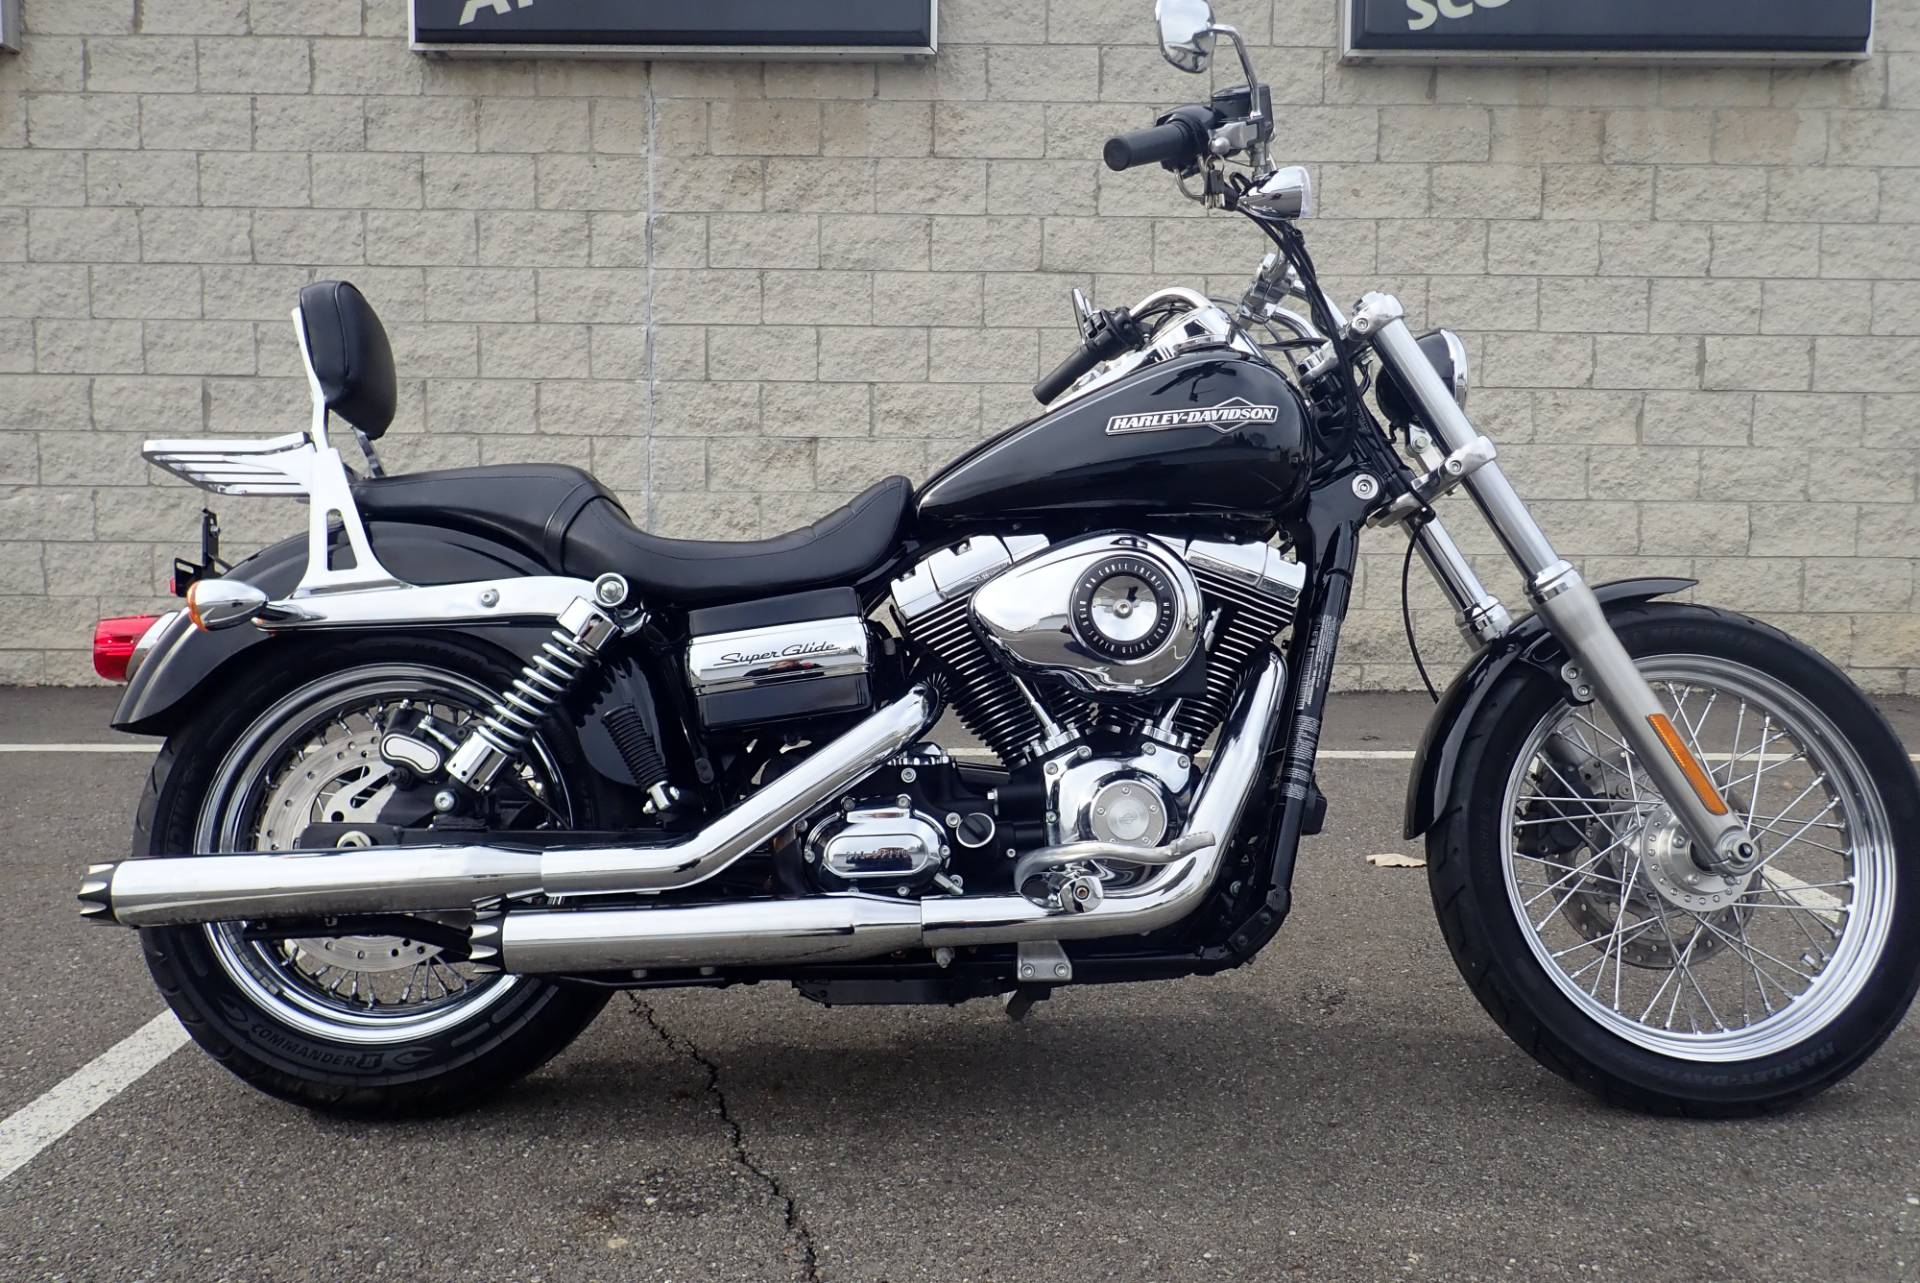 2012 Harley-Davidson Dyna® Super Glide® Custom Motorcycles